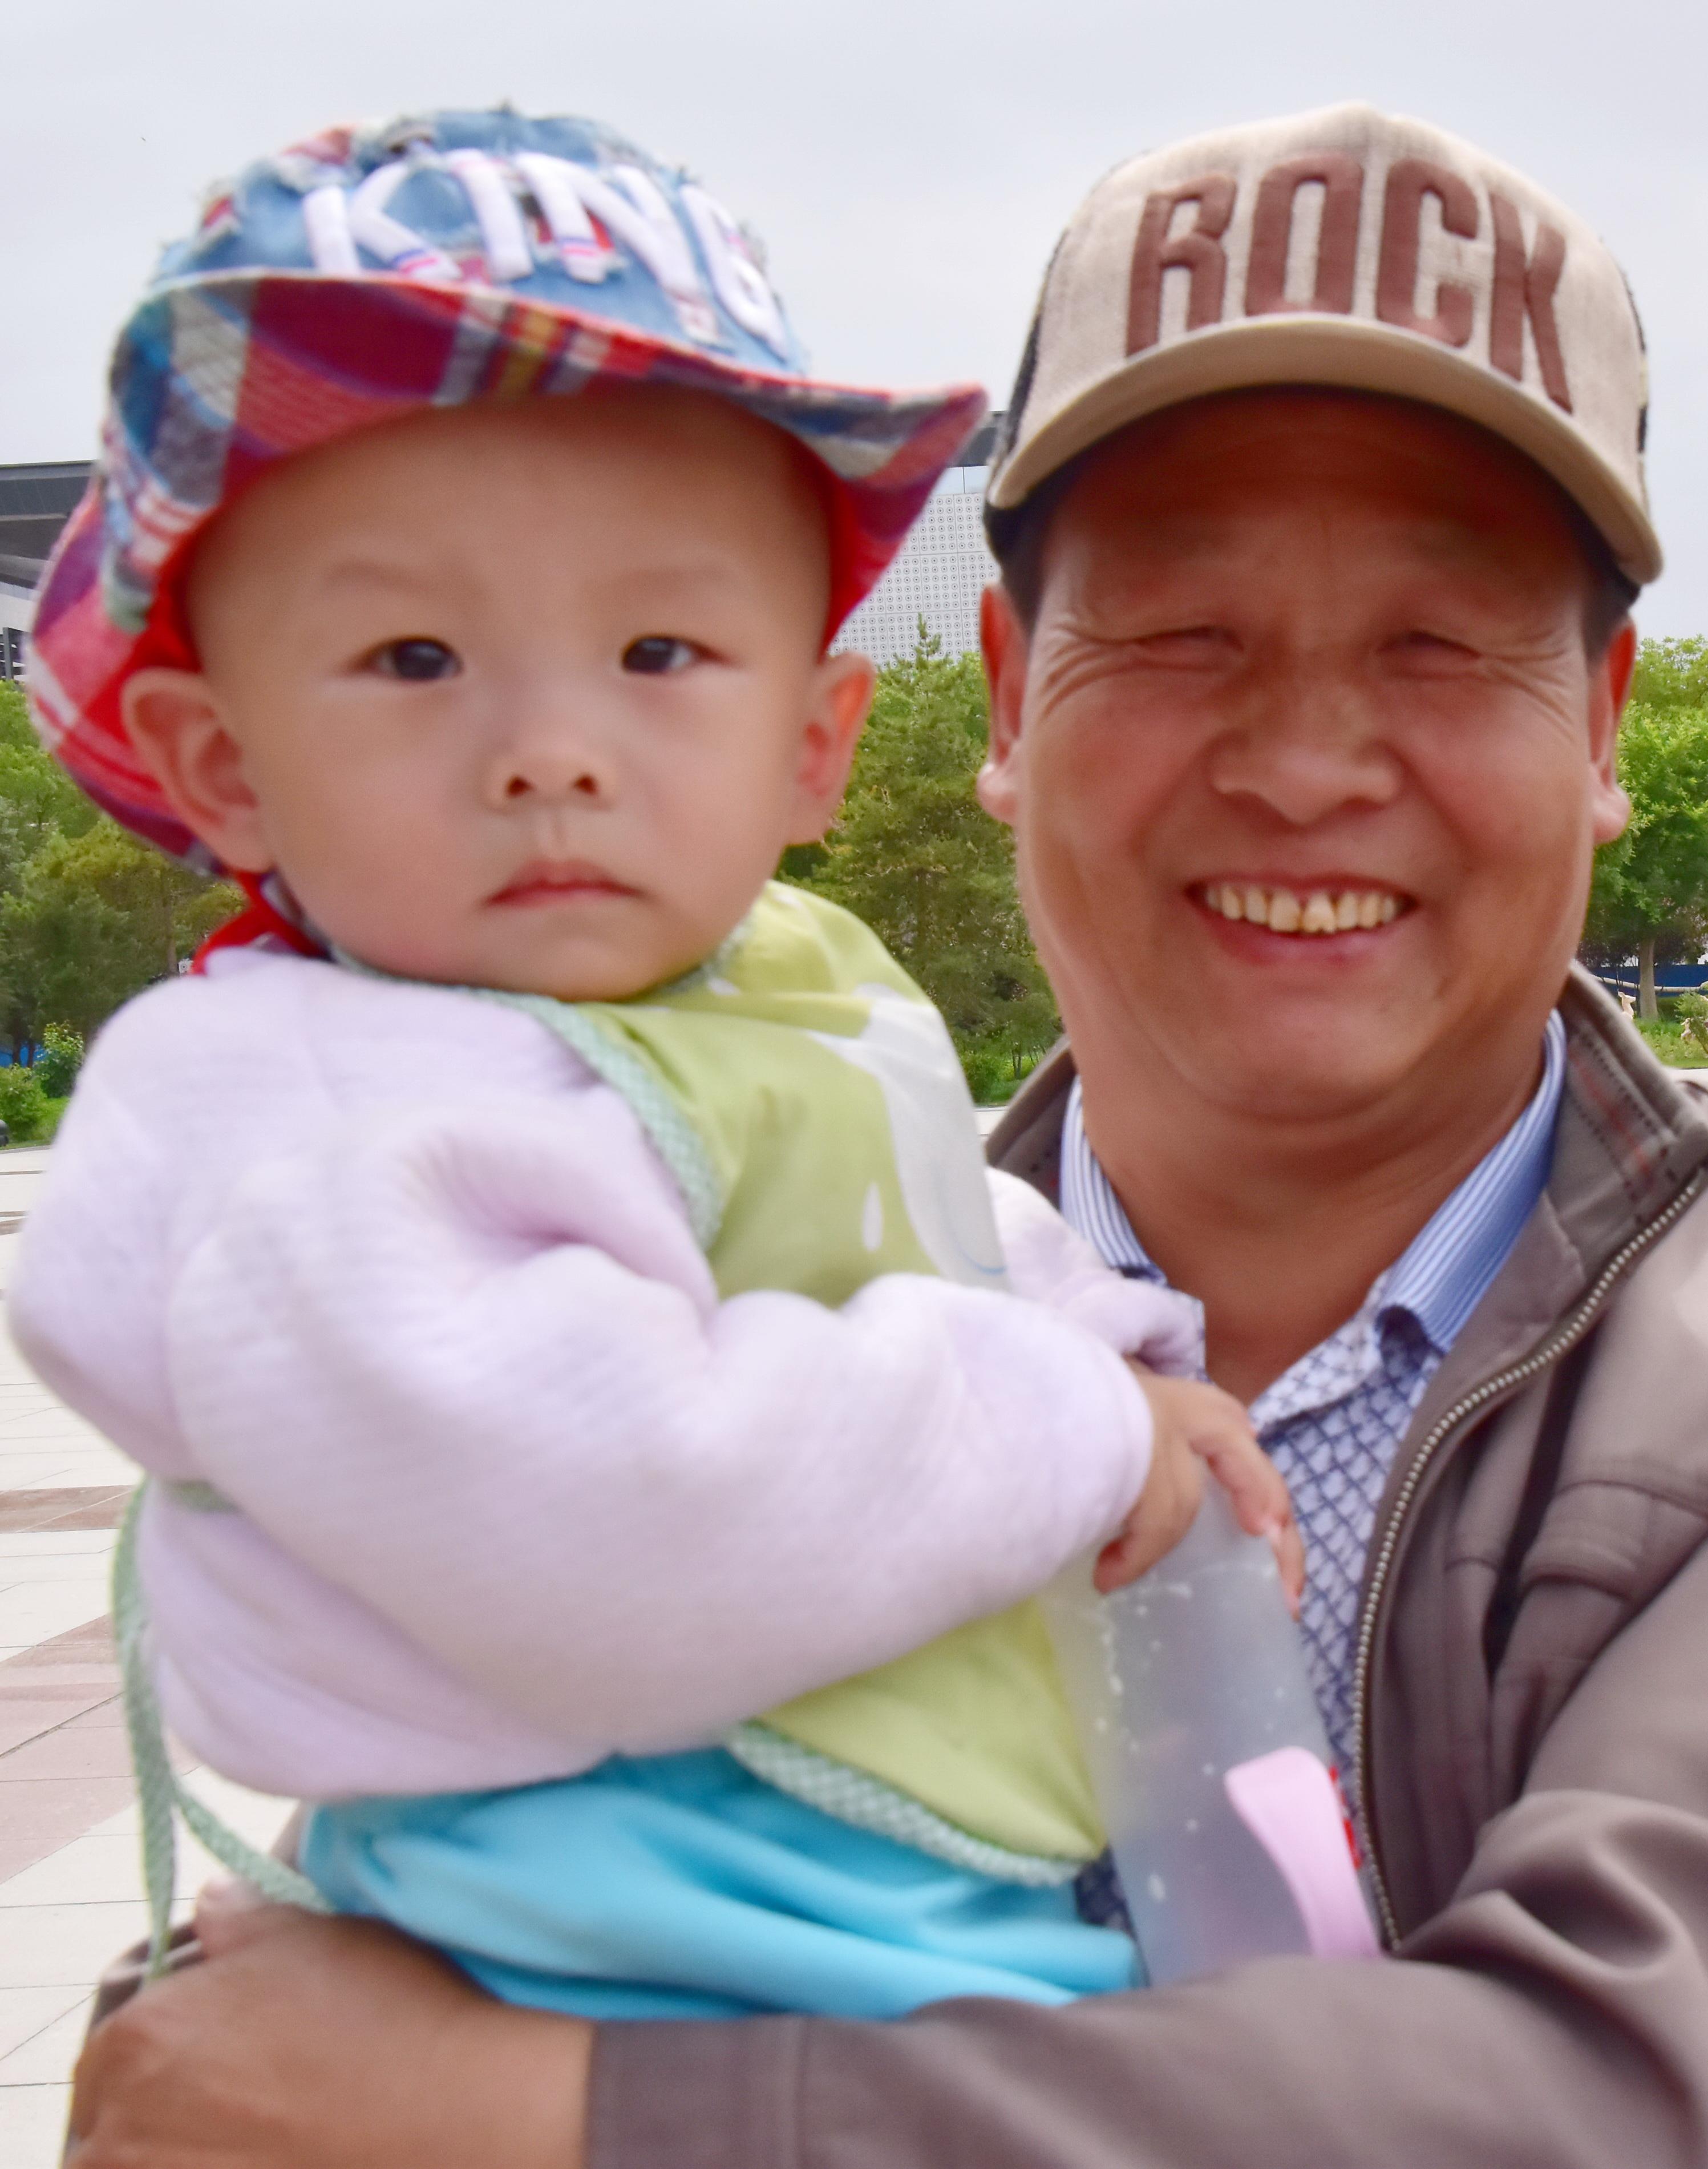 סין - אב וביתו 2